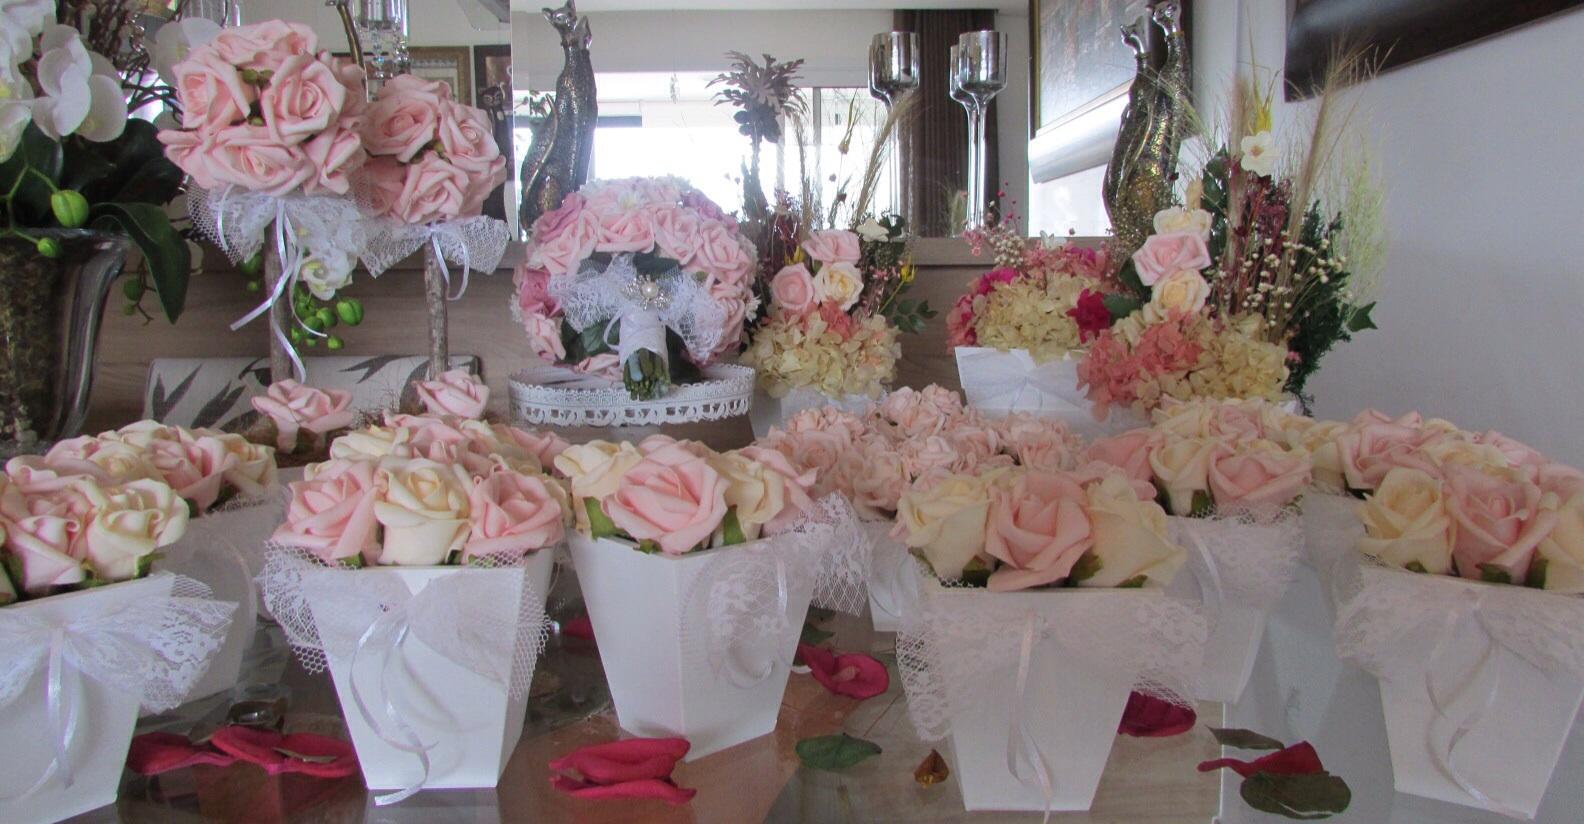 kit decoracao casamento:kit mini casamento rosa com rendas i decoracao provencal kit